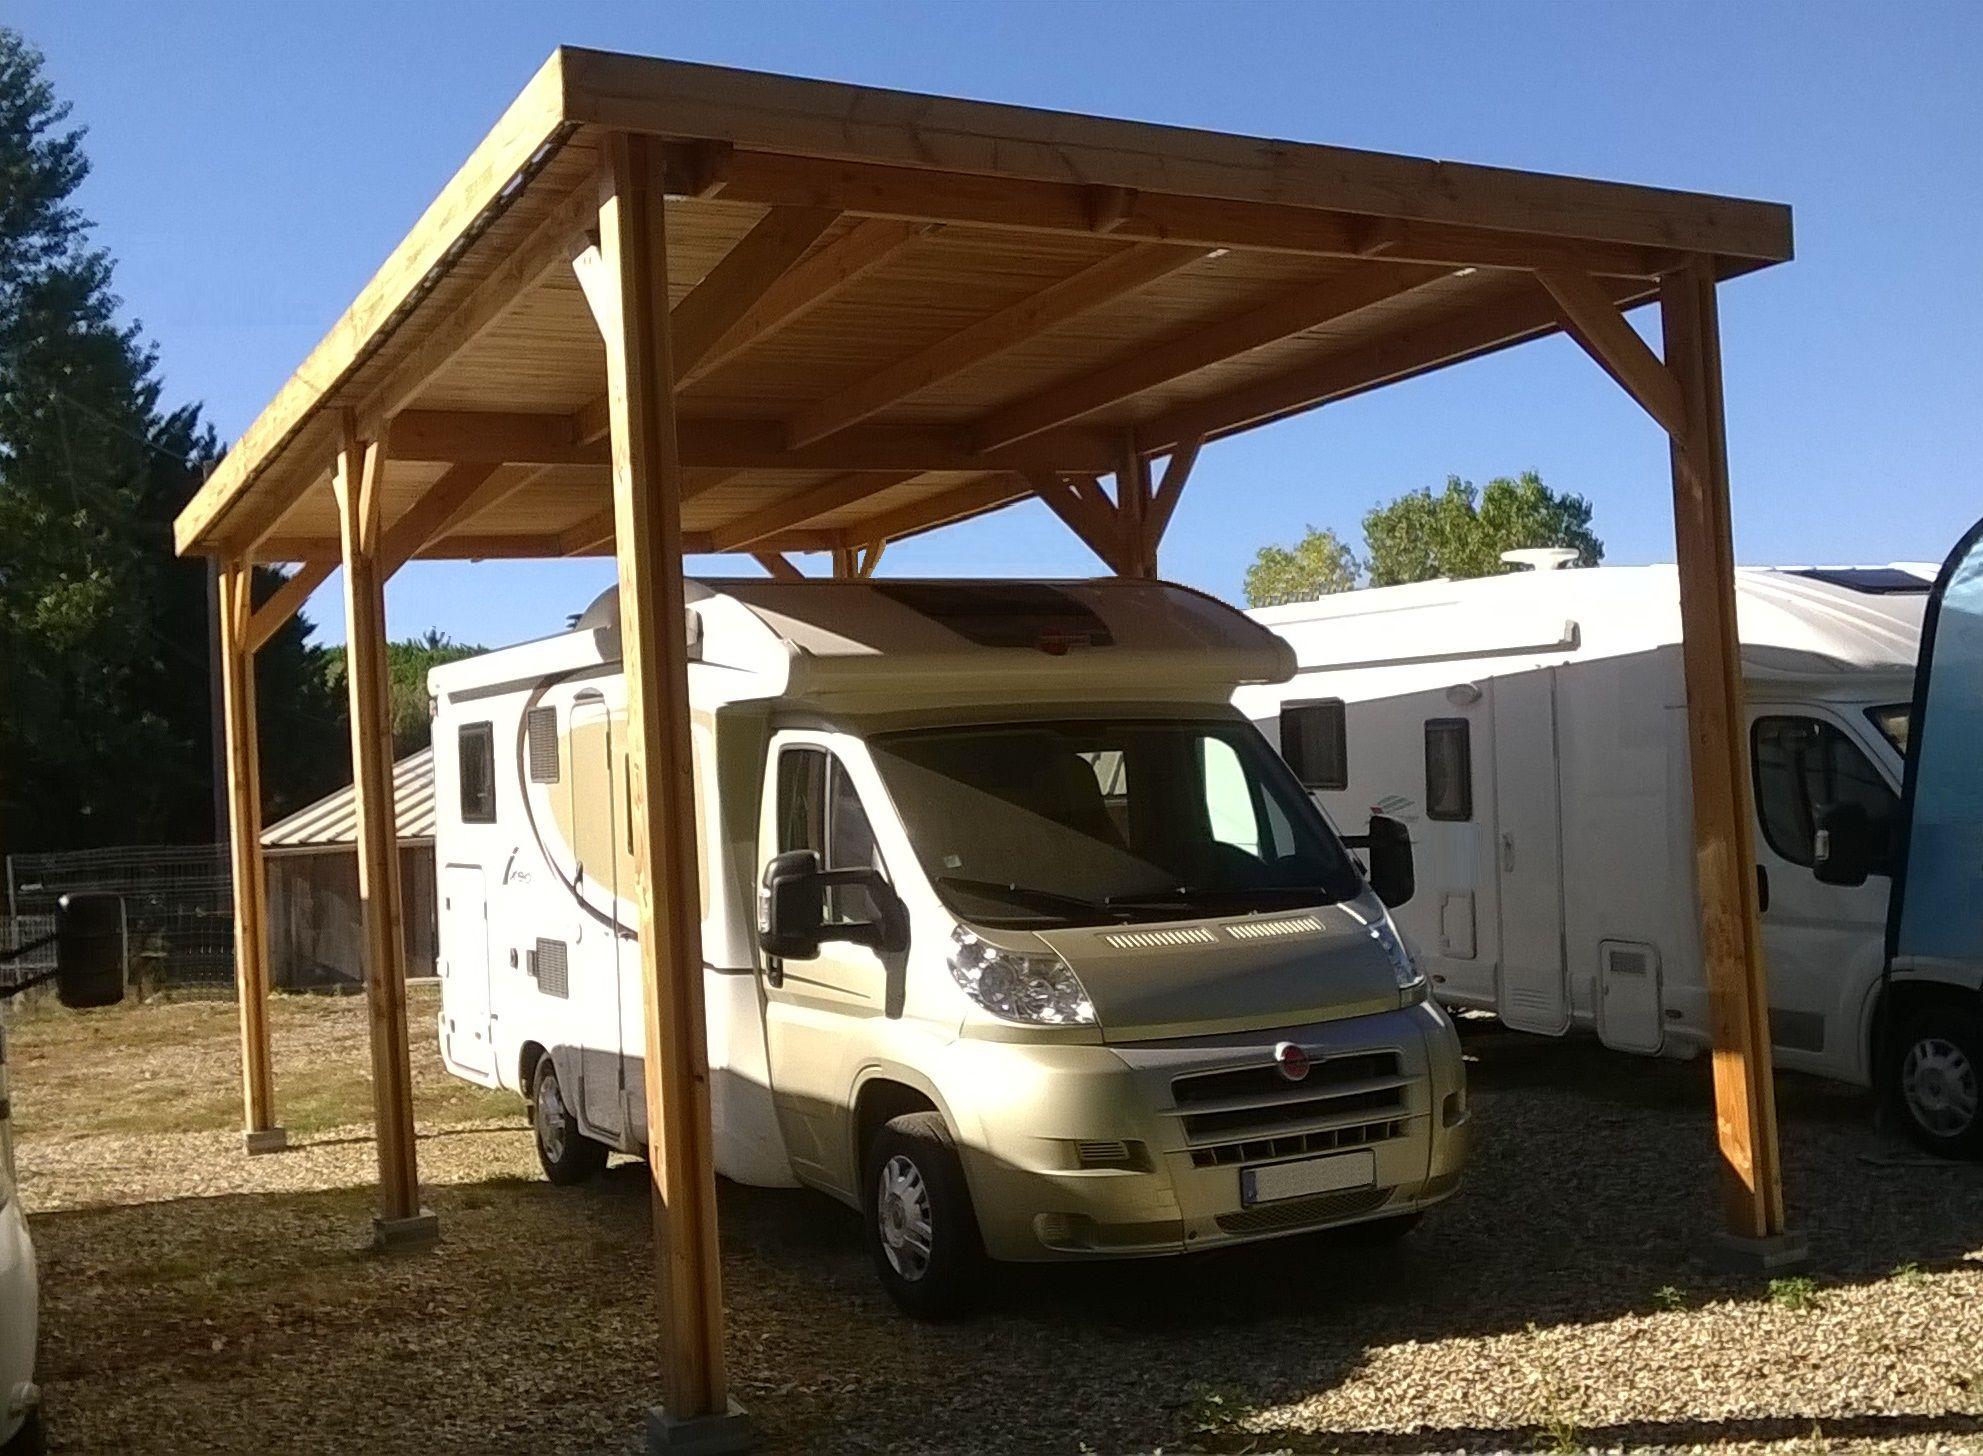 kit abri camping car douglas 3 74 x 7 75 x 3 20m mod le ind pendant toit plat vendu avec sa. Black Bedroom Furniture Sets. Home Design Ideas